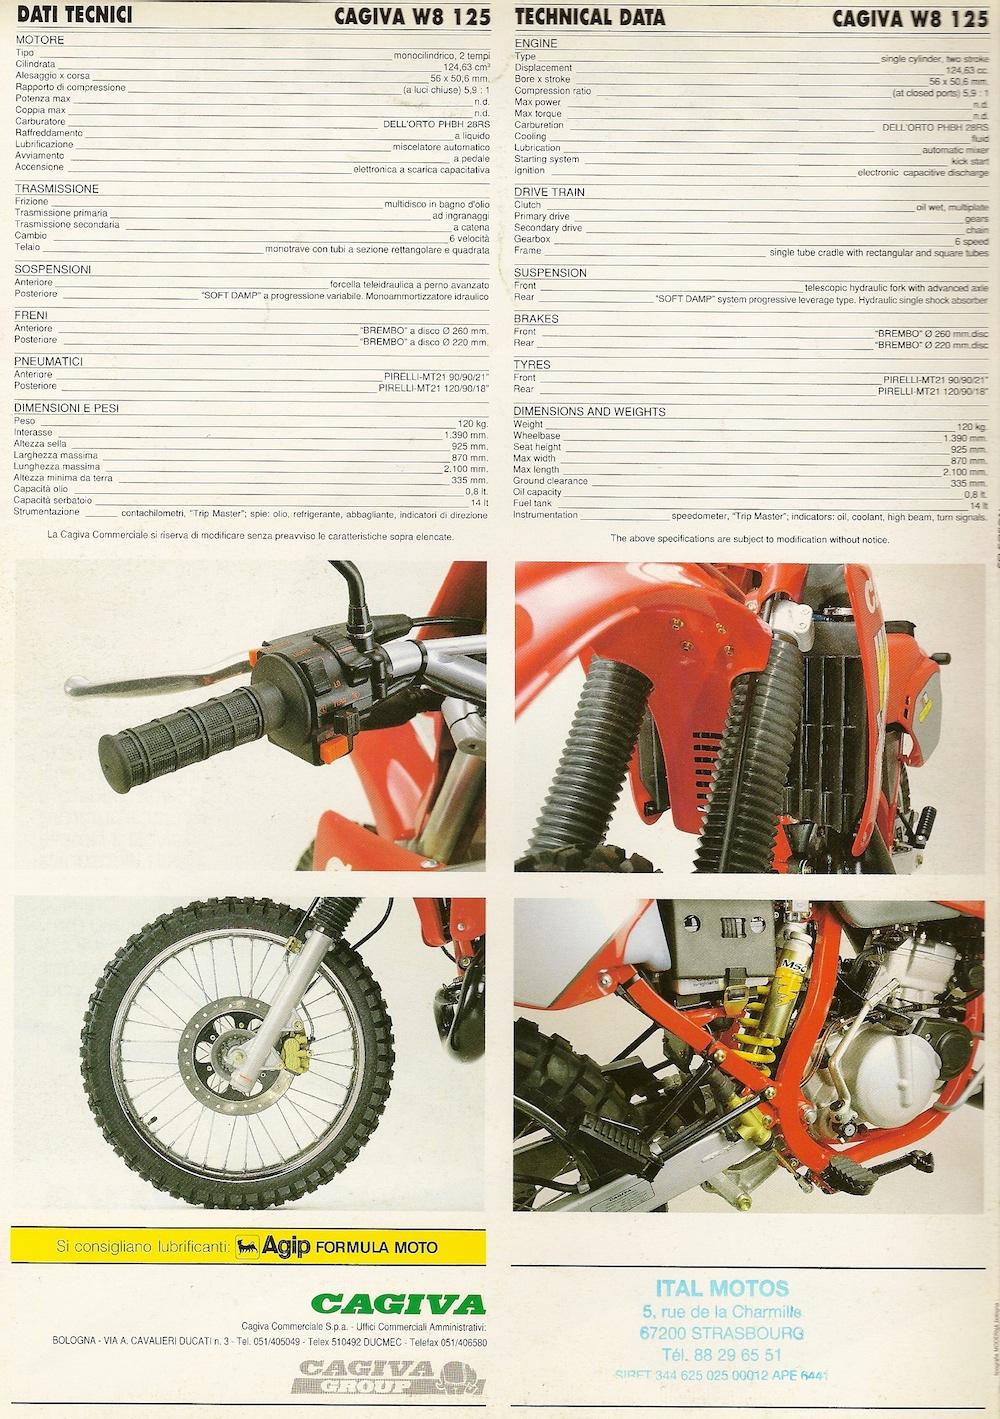 Cagiva W8 125 (1)